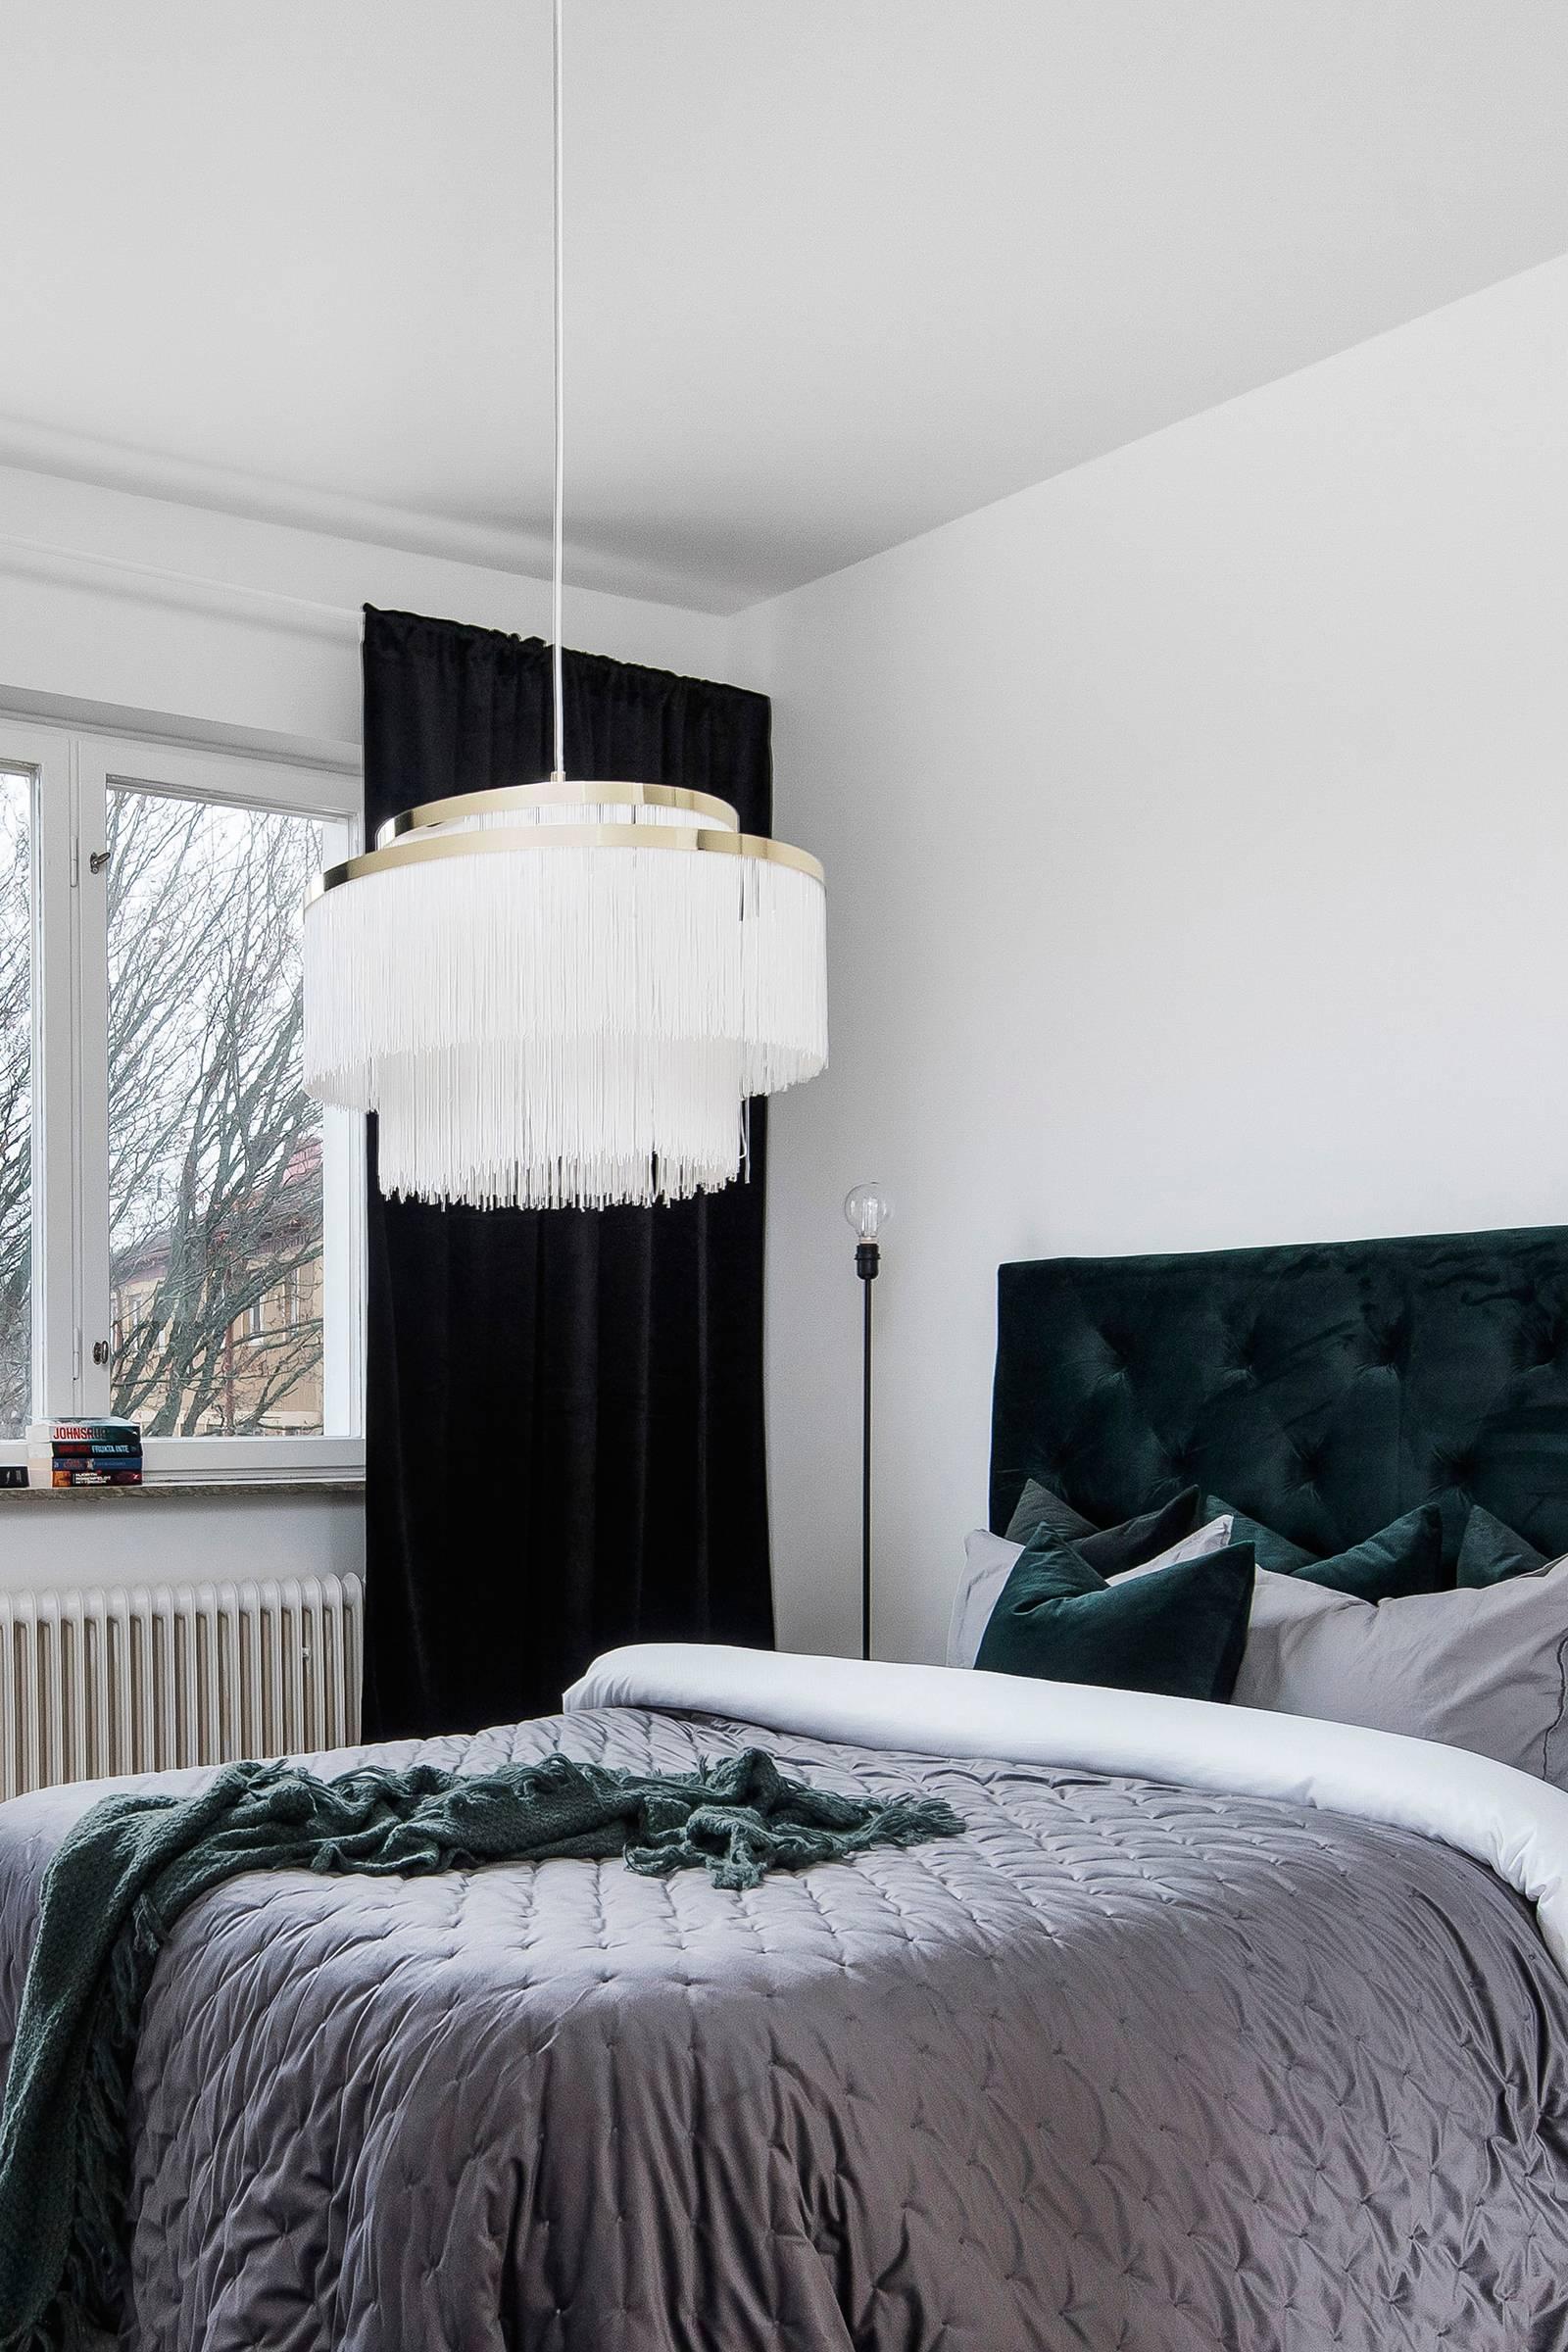 Globen lighting Taklampa Frans Vit Belysning Homeroom.se